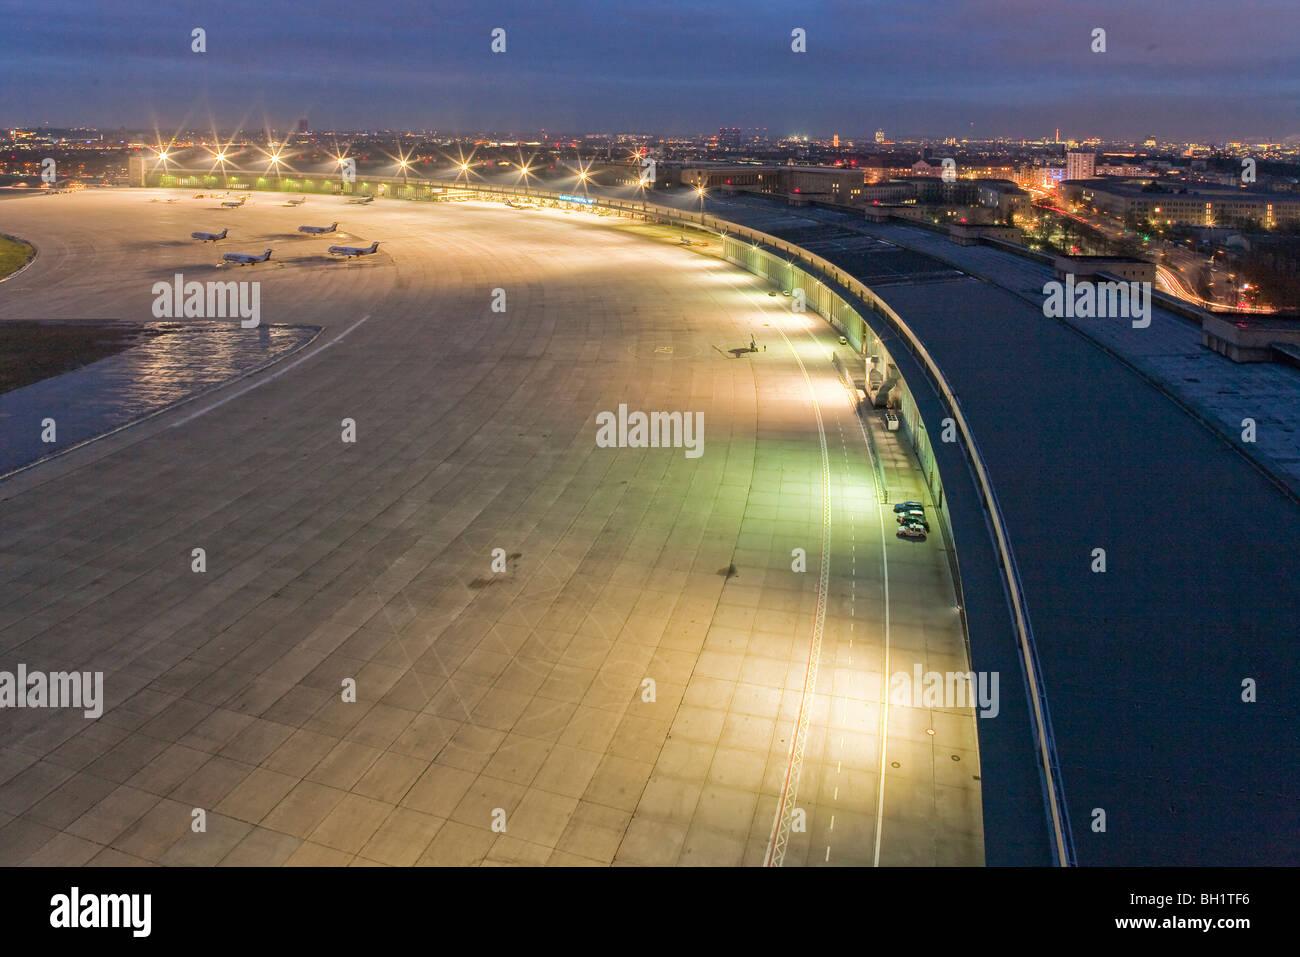 Tempelhof Airport at night, apron, runway, Berlin, Germany - Stock Image